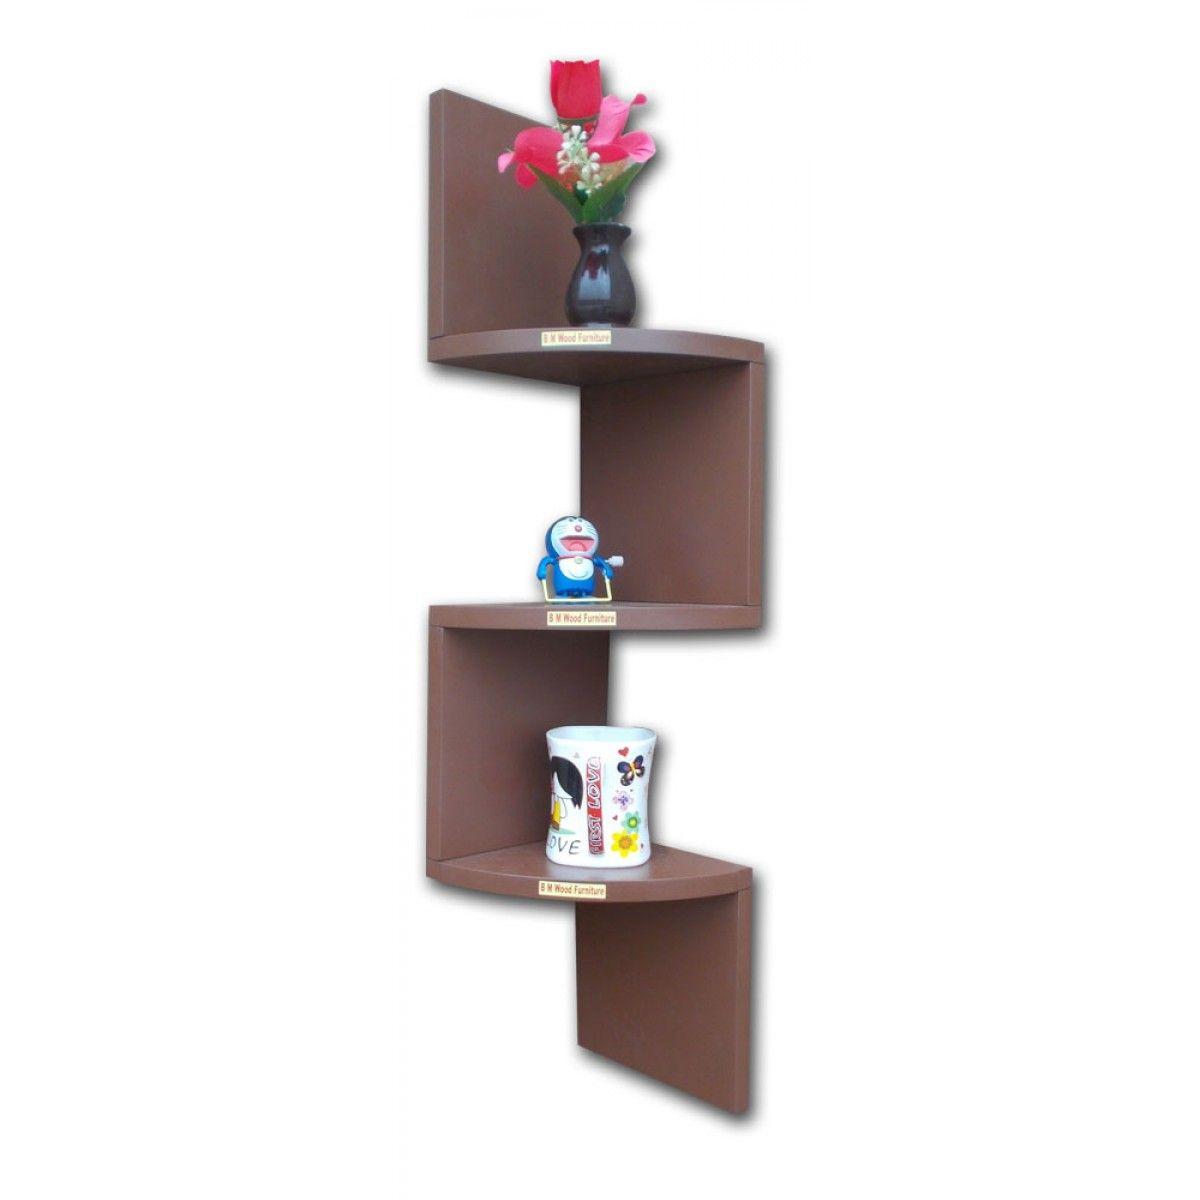 BM WOOD Furniture Zigzag Shaped 3 Curved Wall Corner Shelf